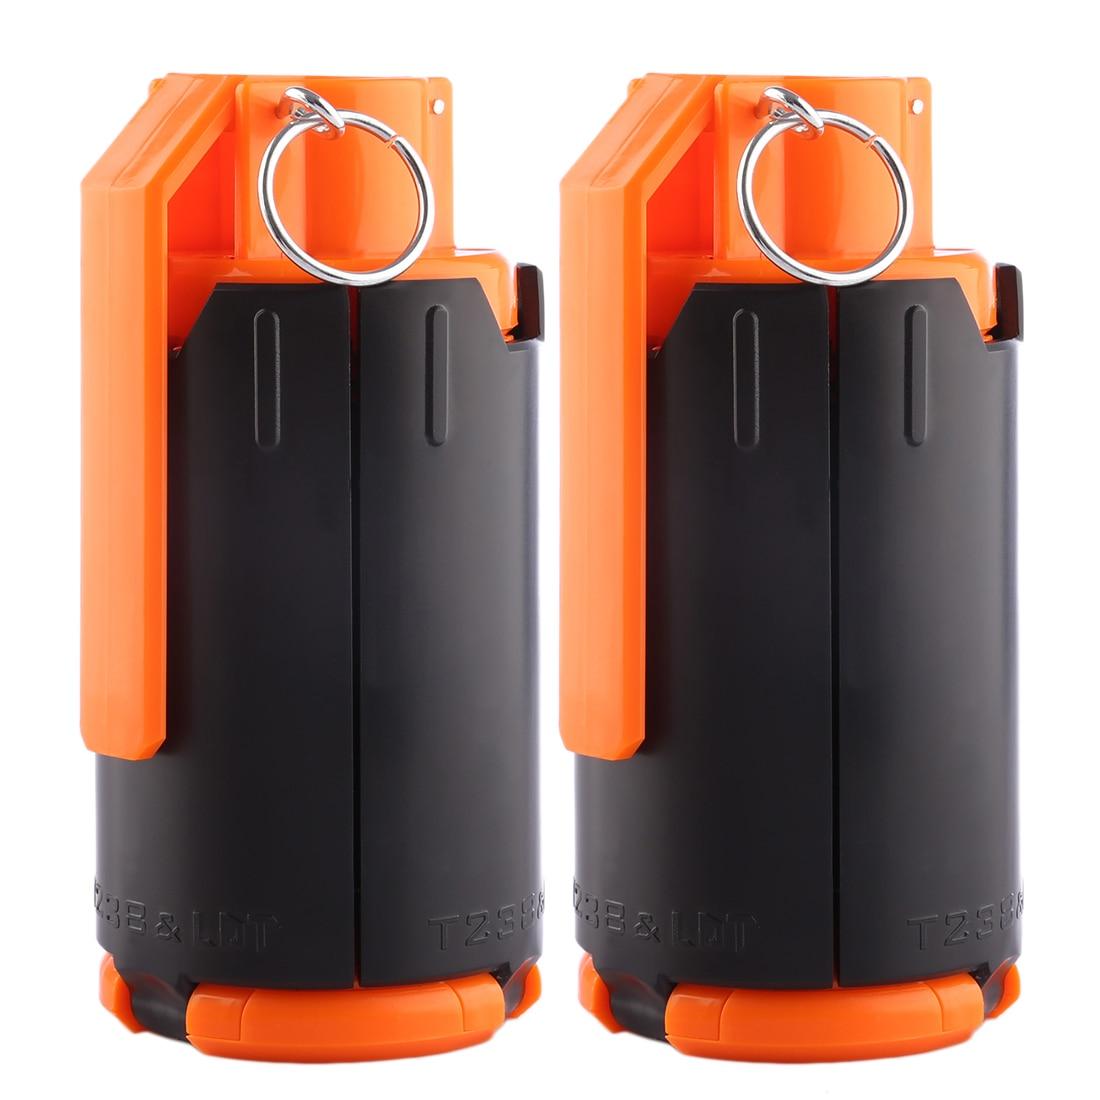 2pcs Toys Tactical Plastic Modified Crystal Water Beads Bomb Bullet Black+Orange Outdoor Free Shipping сумка dicom utah 21 black orange